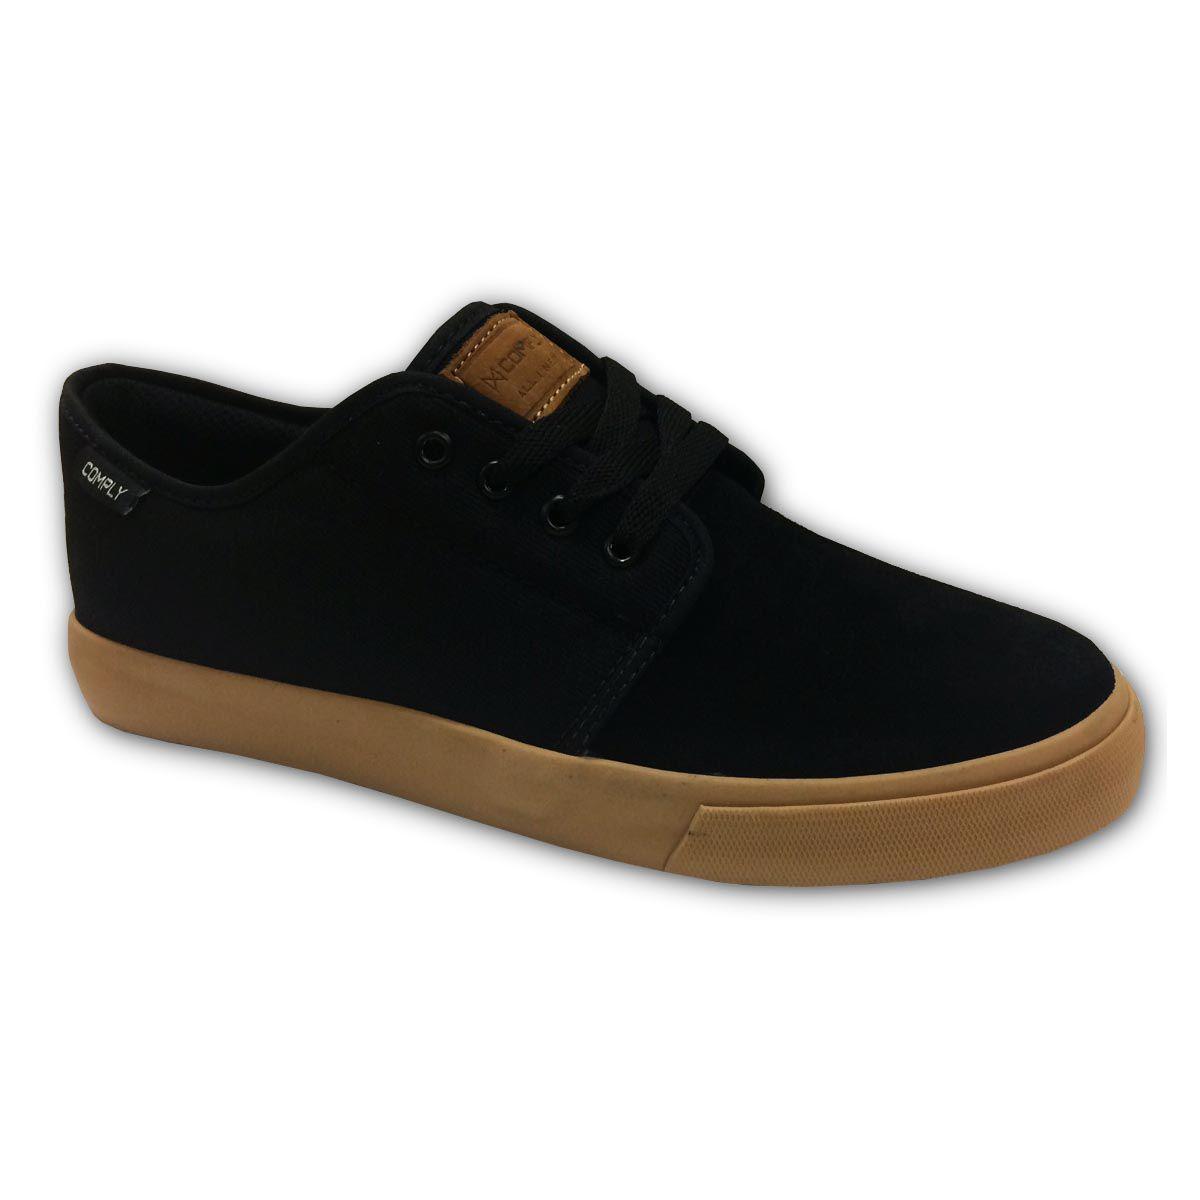 Tênis Comply skate unissex 11887